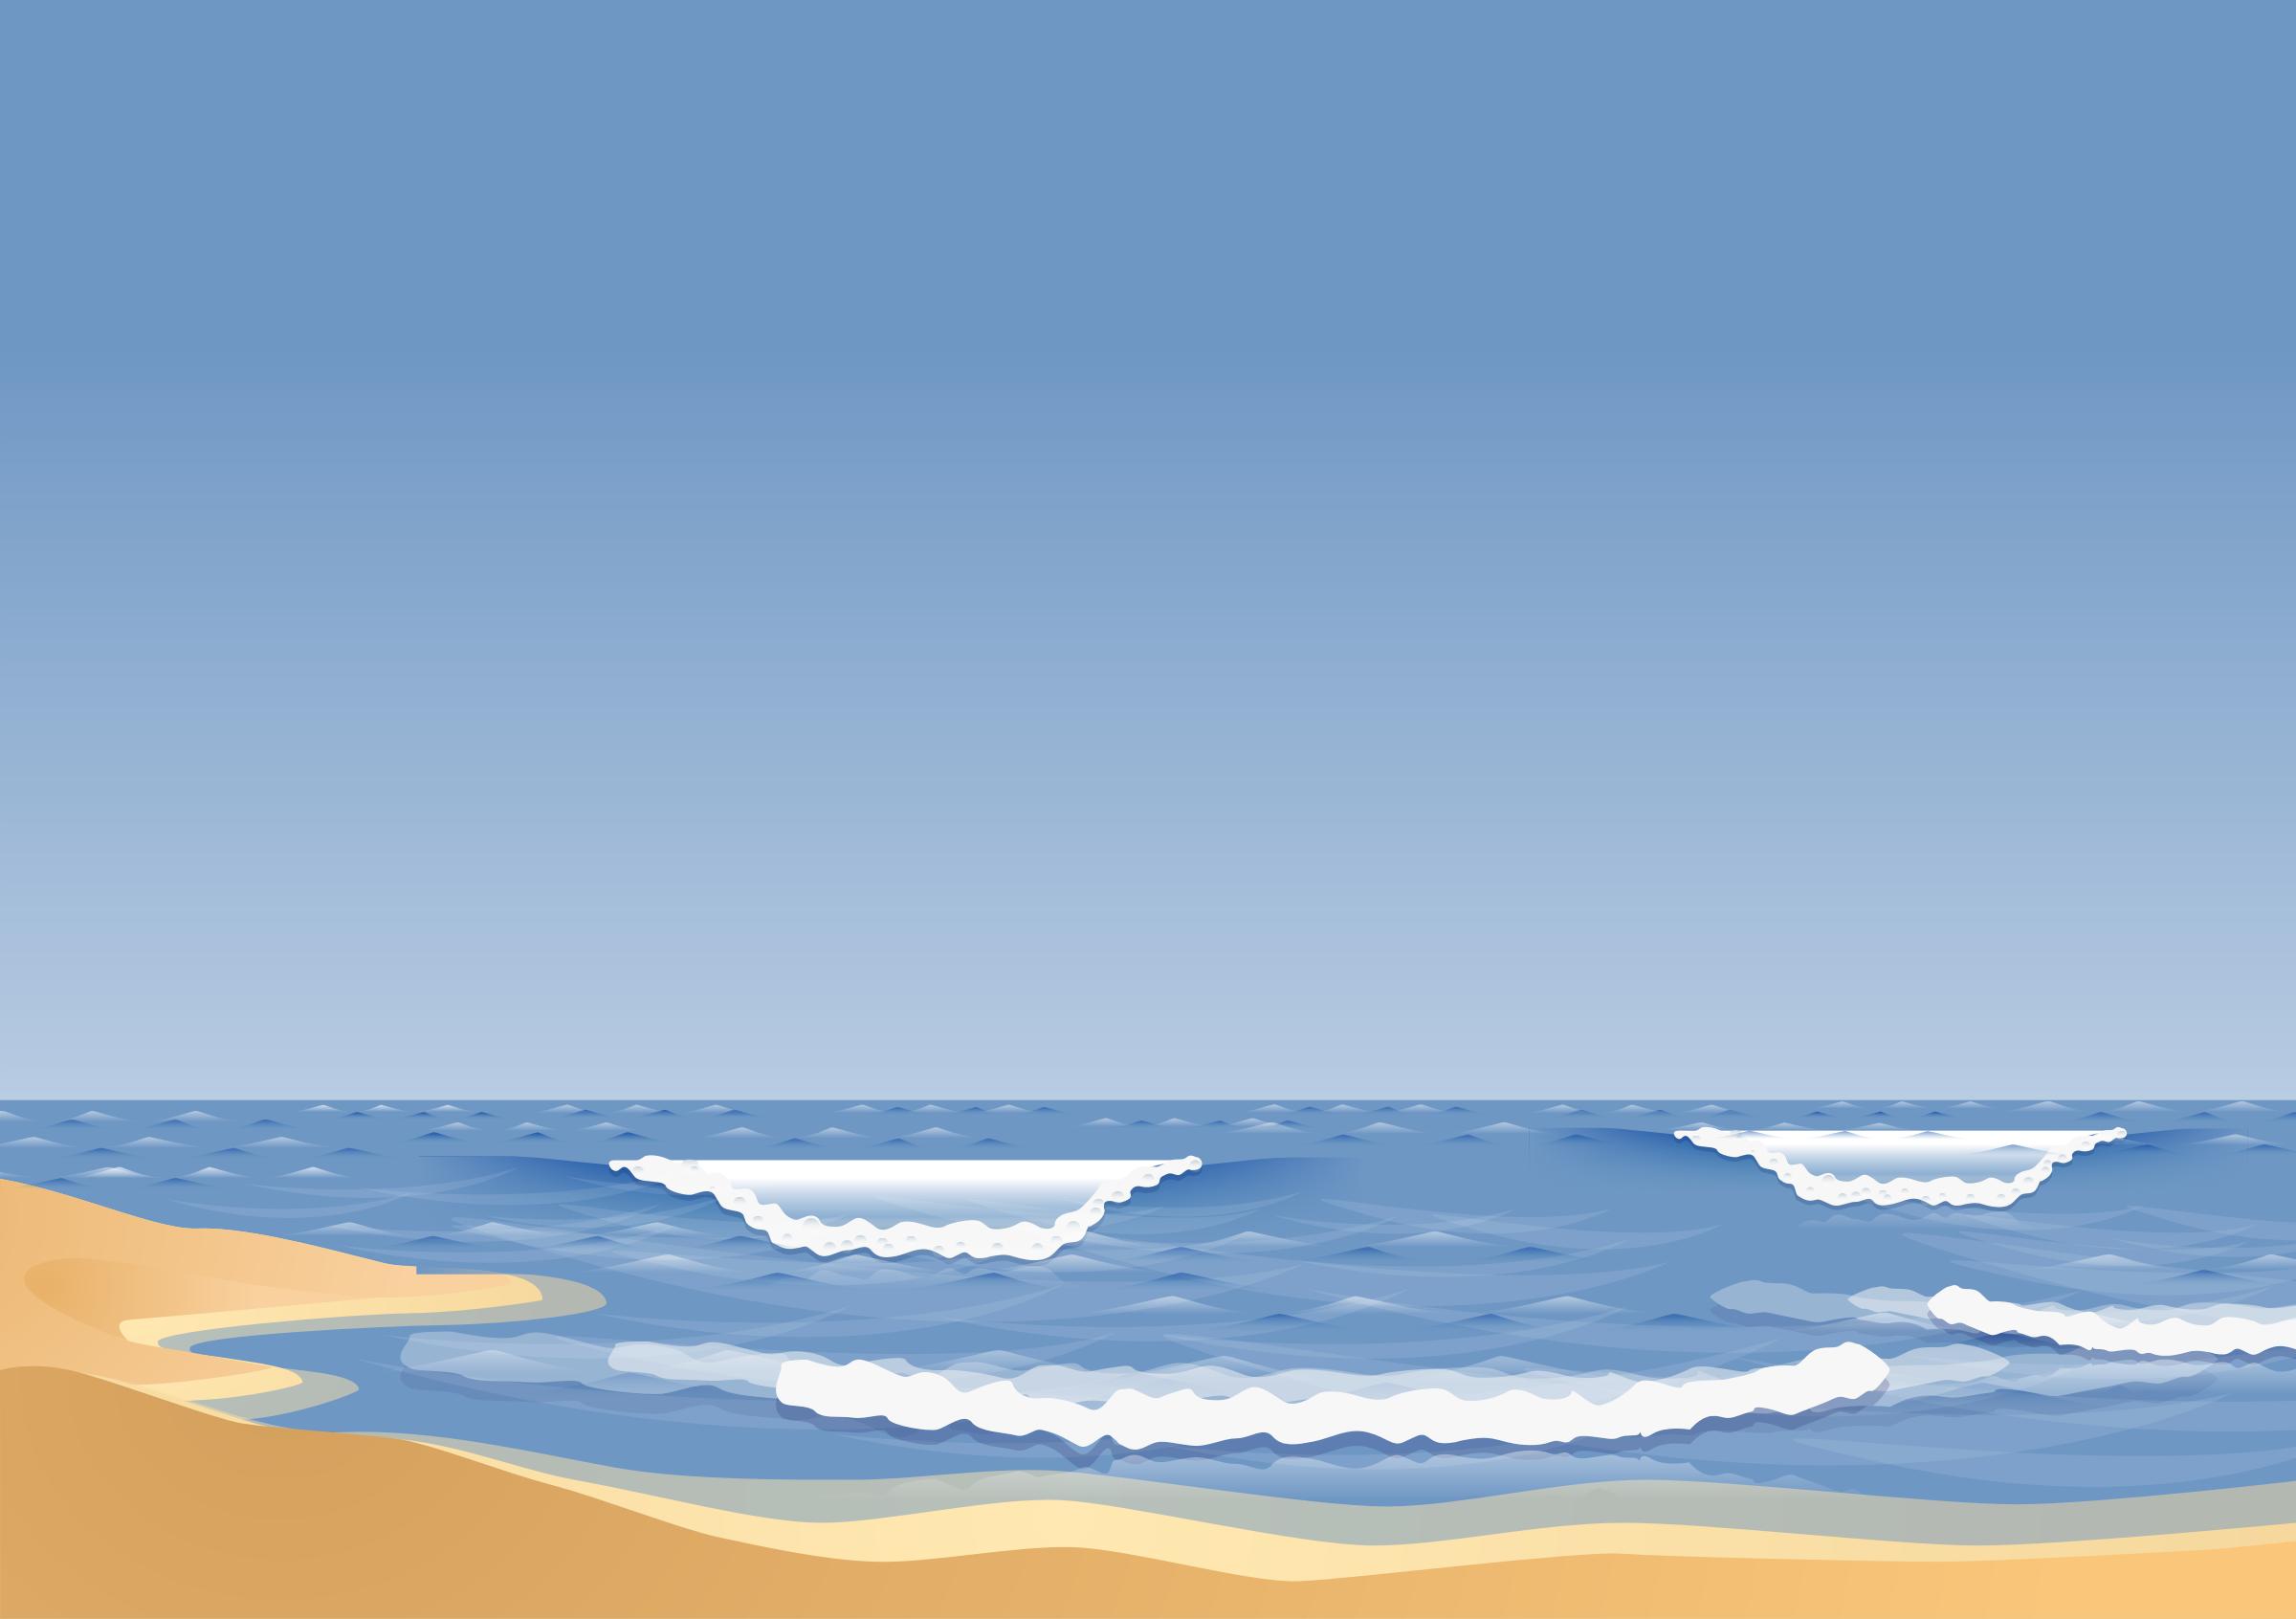 Wave beach. Sandy with waves vector